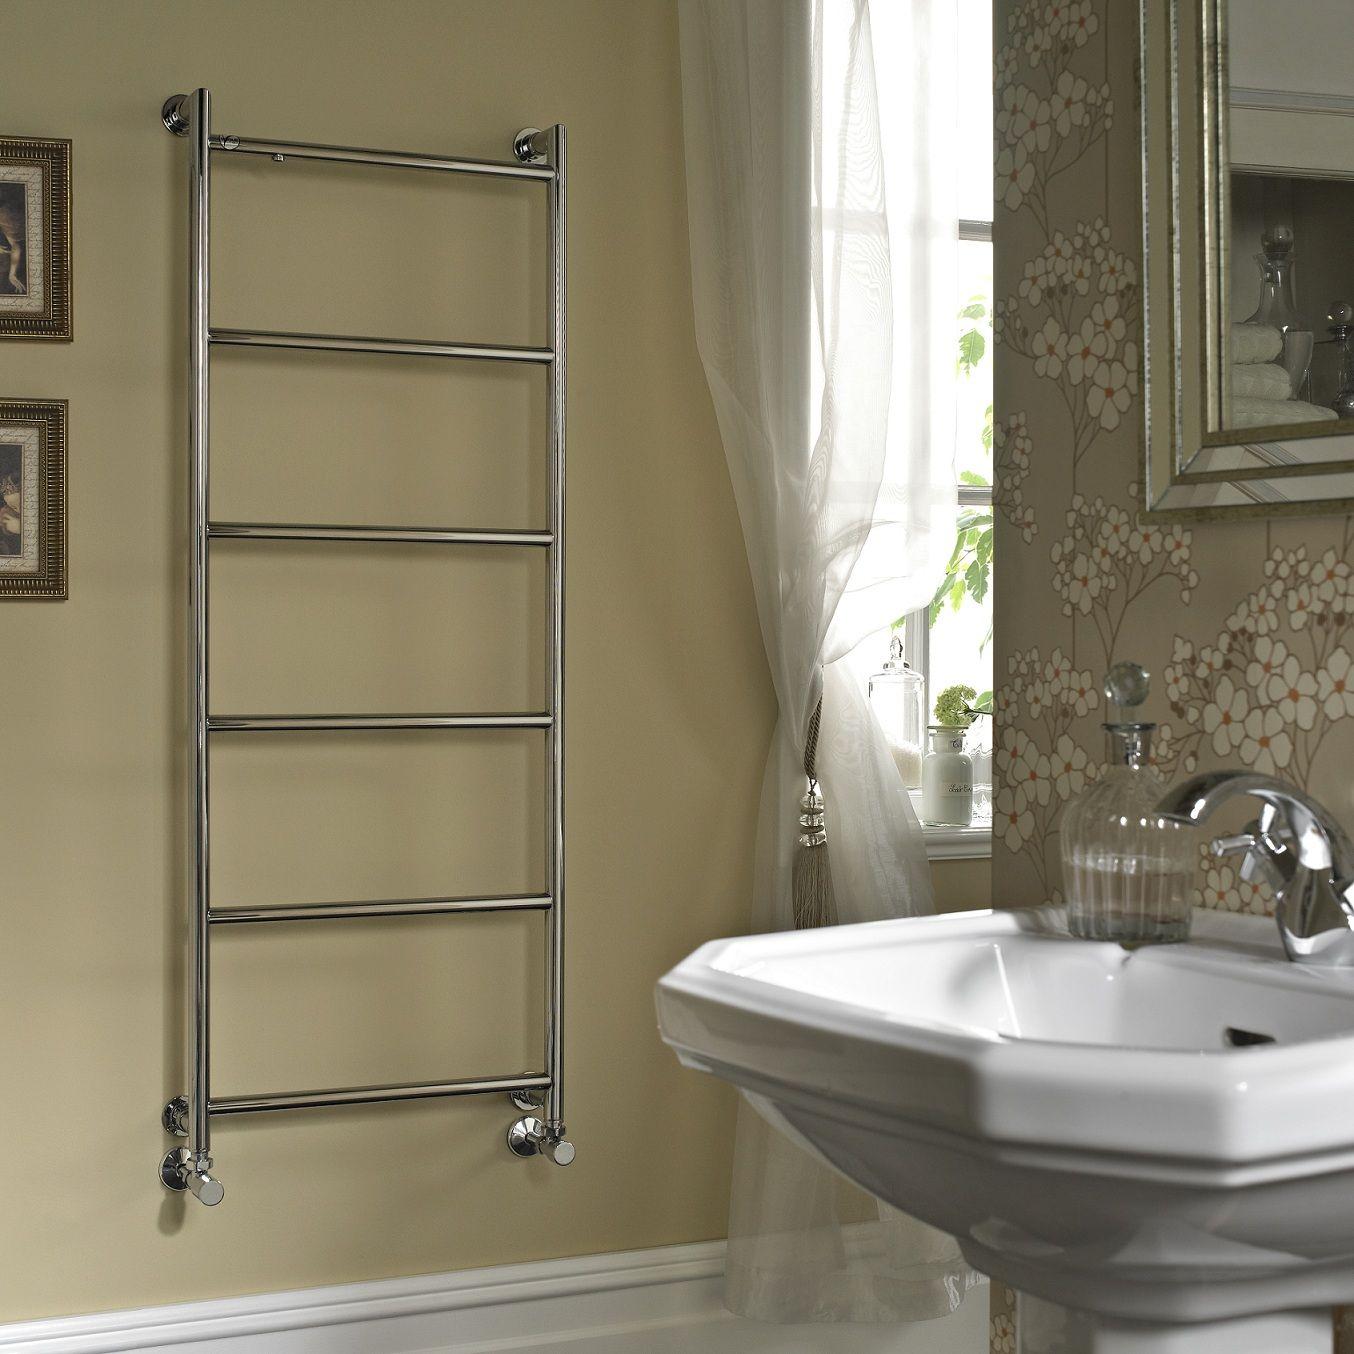 Be inspired    © Vogue UK Ltd #interiordesign #bathroom